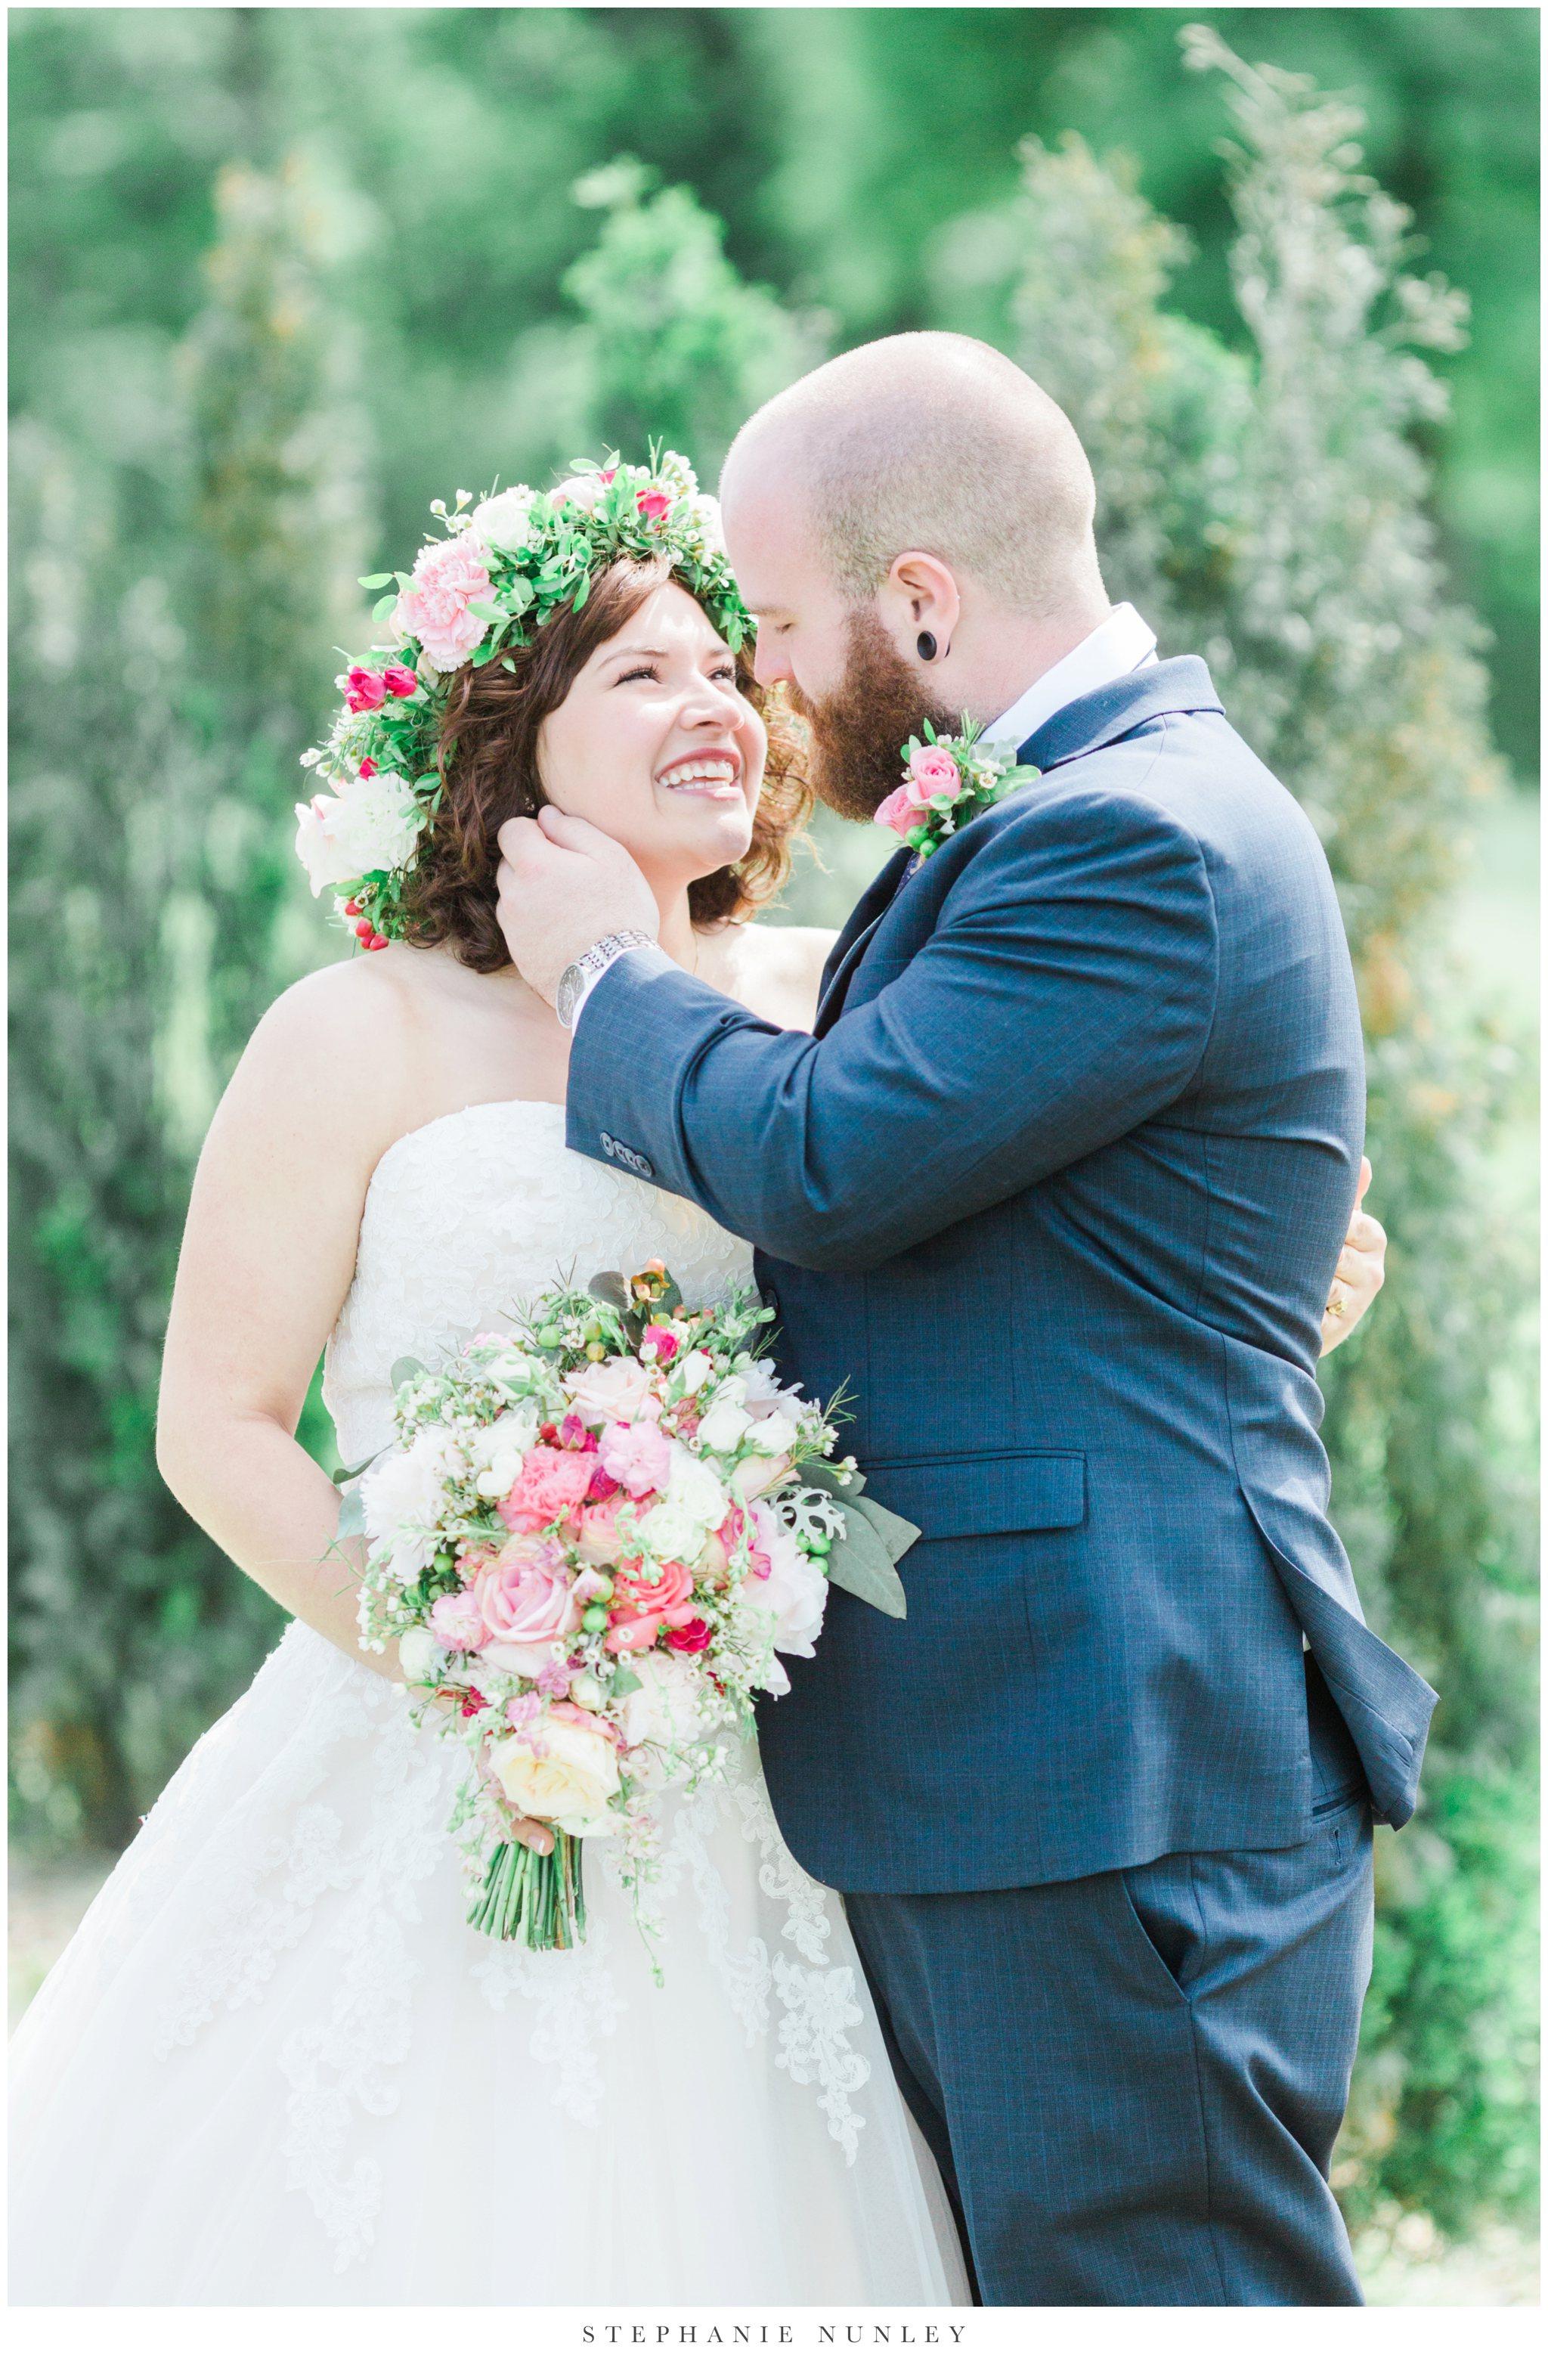 romantic-outdoor-wedding-with-flower-crown-0064.jpg